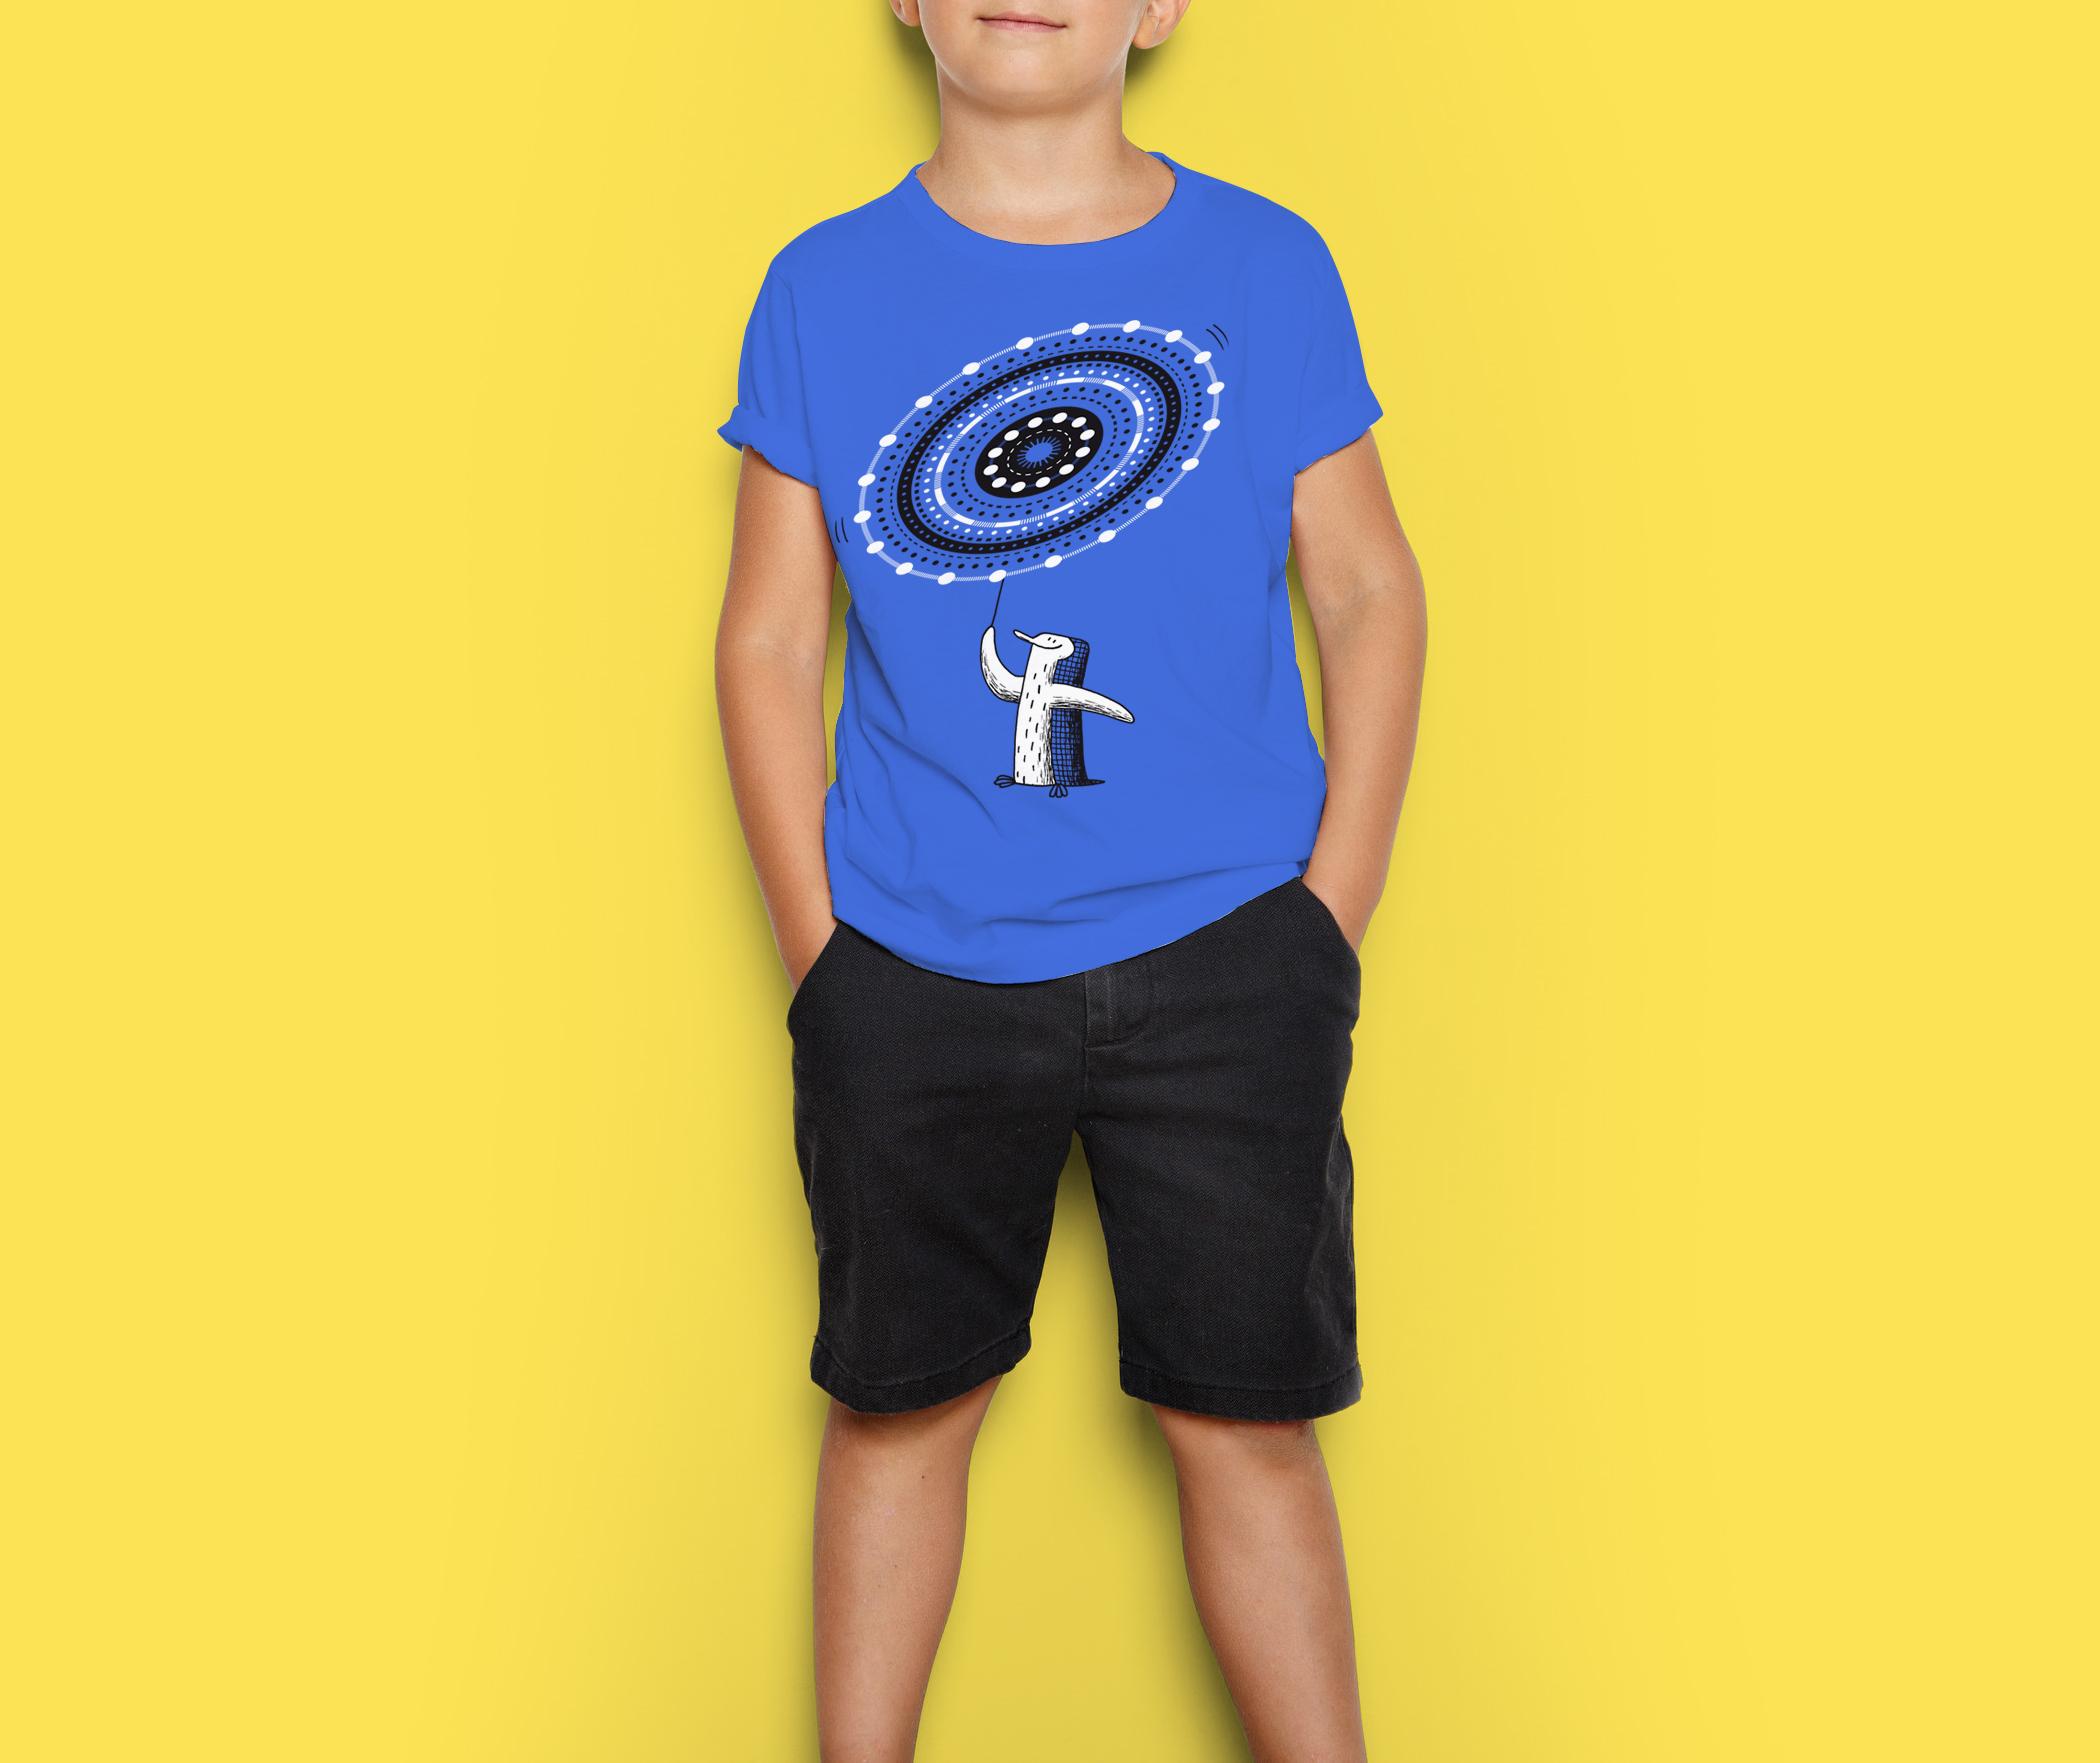 T-Shirt MCirkus in beweging_002.jpg